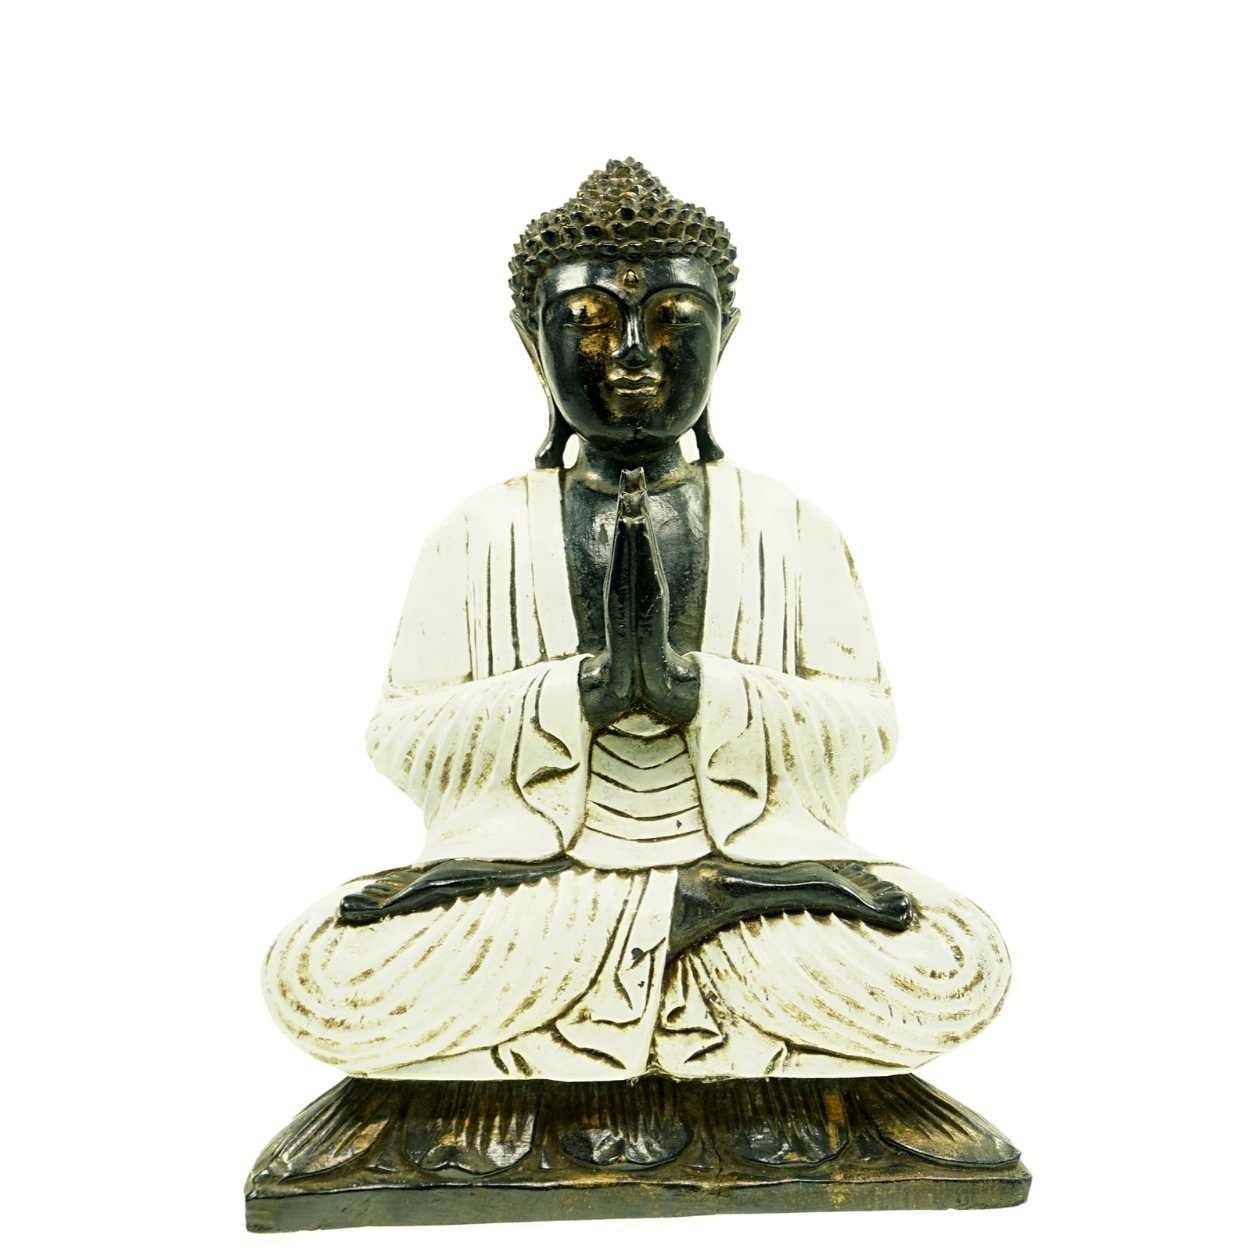 Buddha Nausan Weiss 50 cm Suarholz Unikat